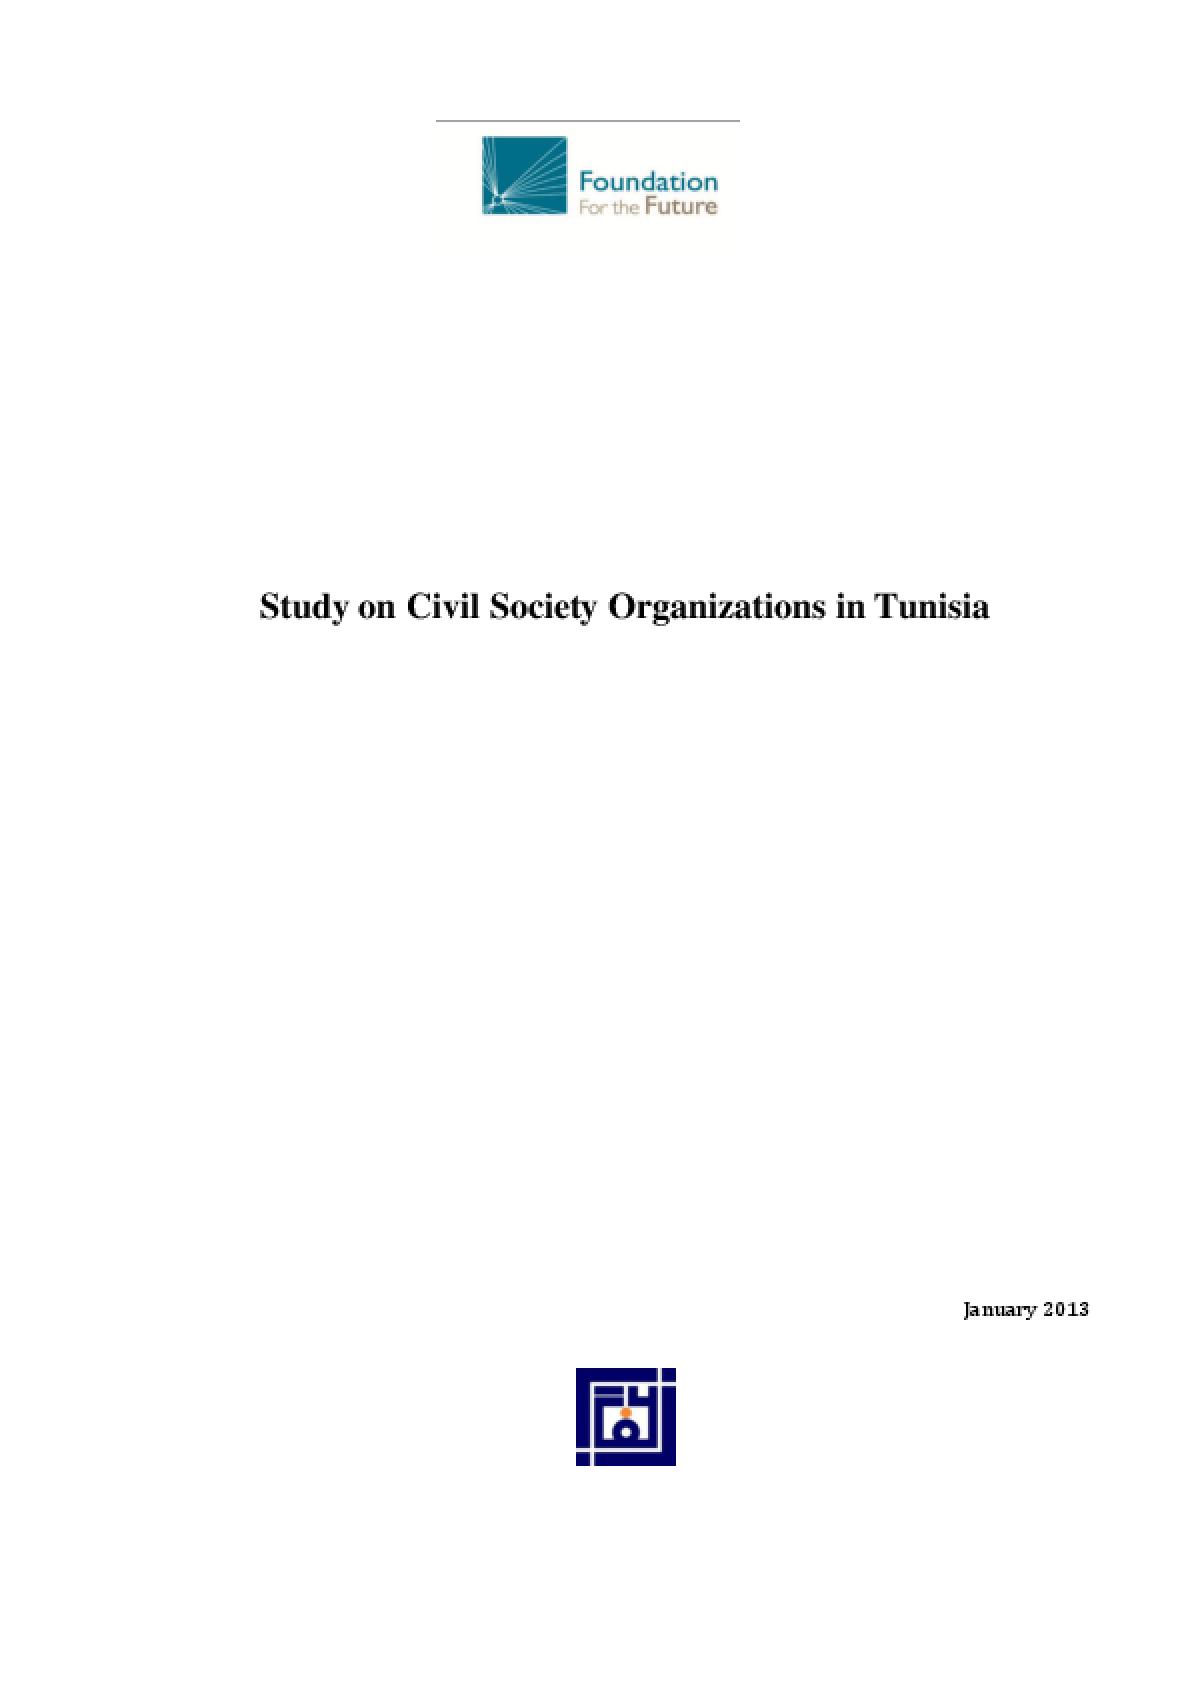 Study on Civil Society Organizations in Tunisia